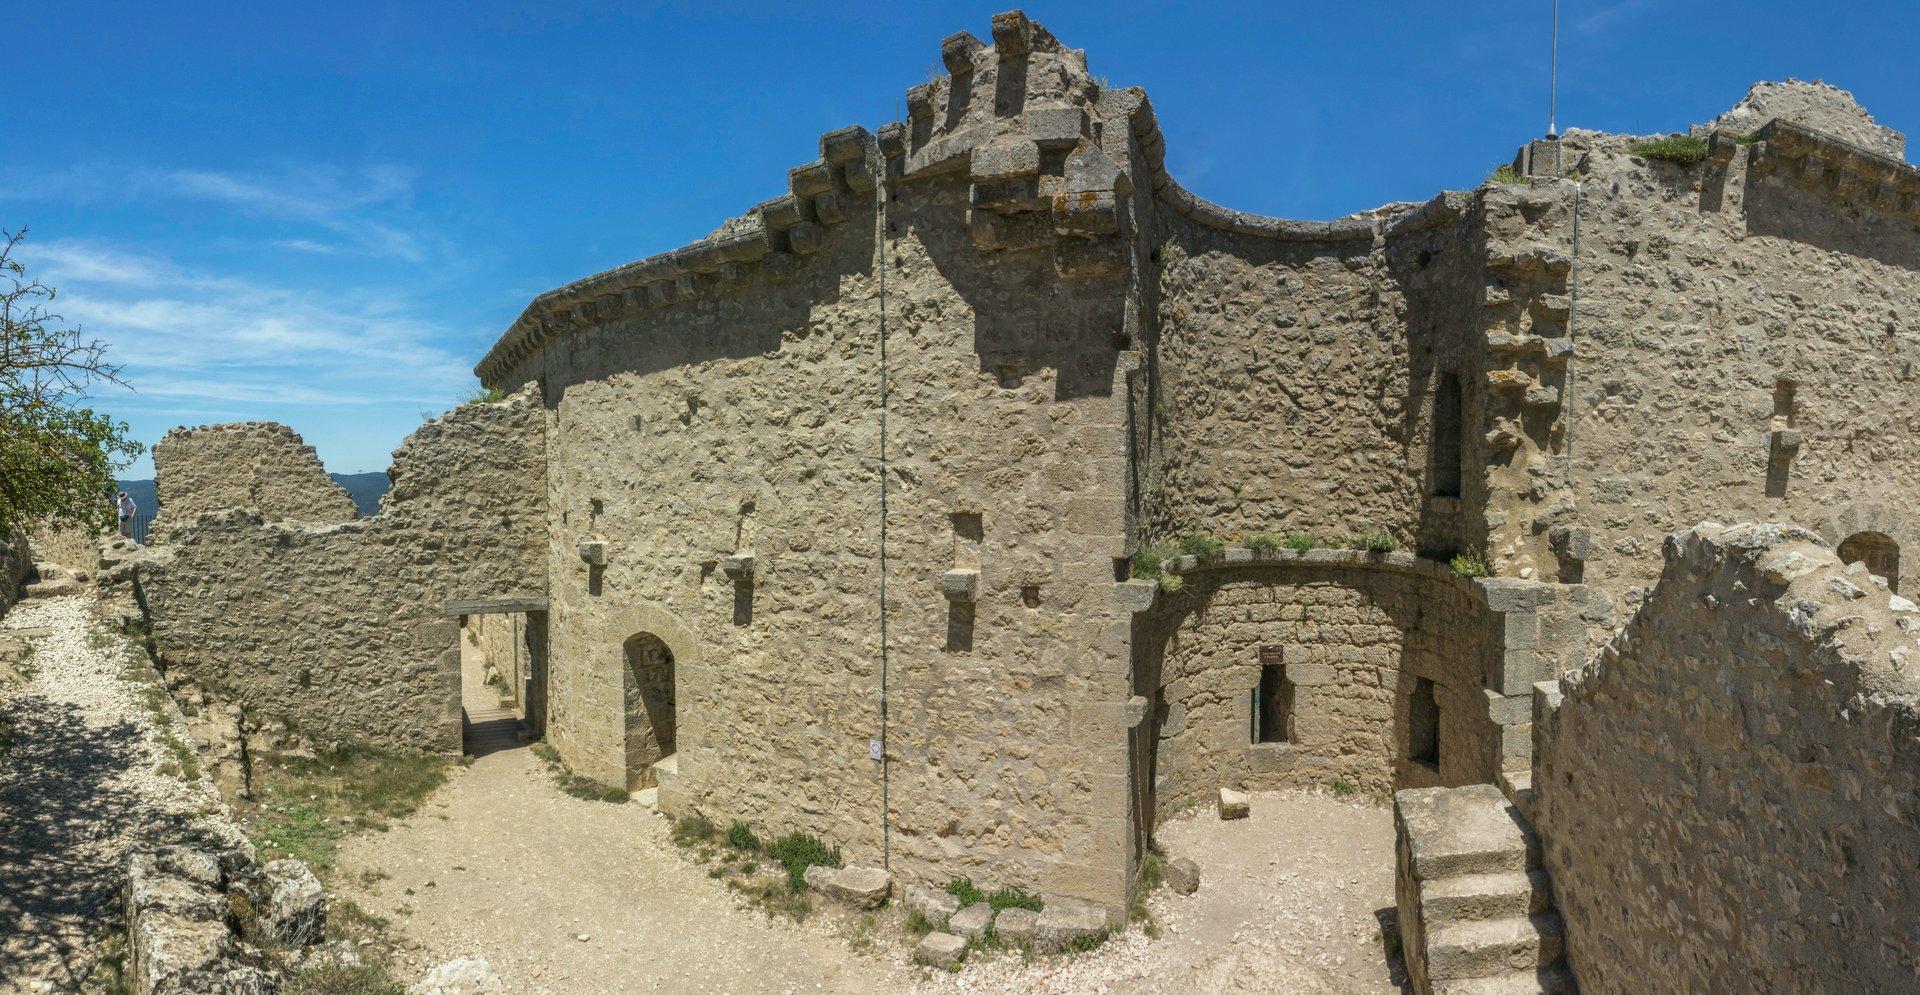 Obere Burg vom Château de Peyrepertuse